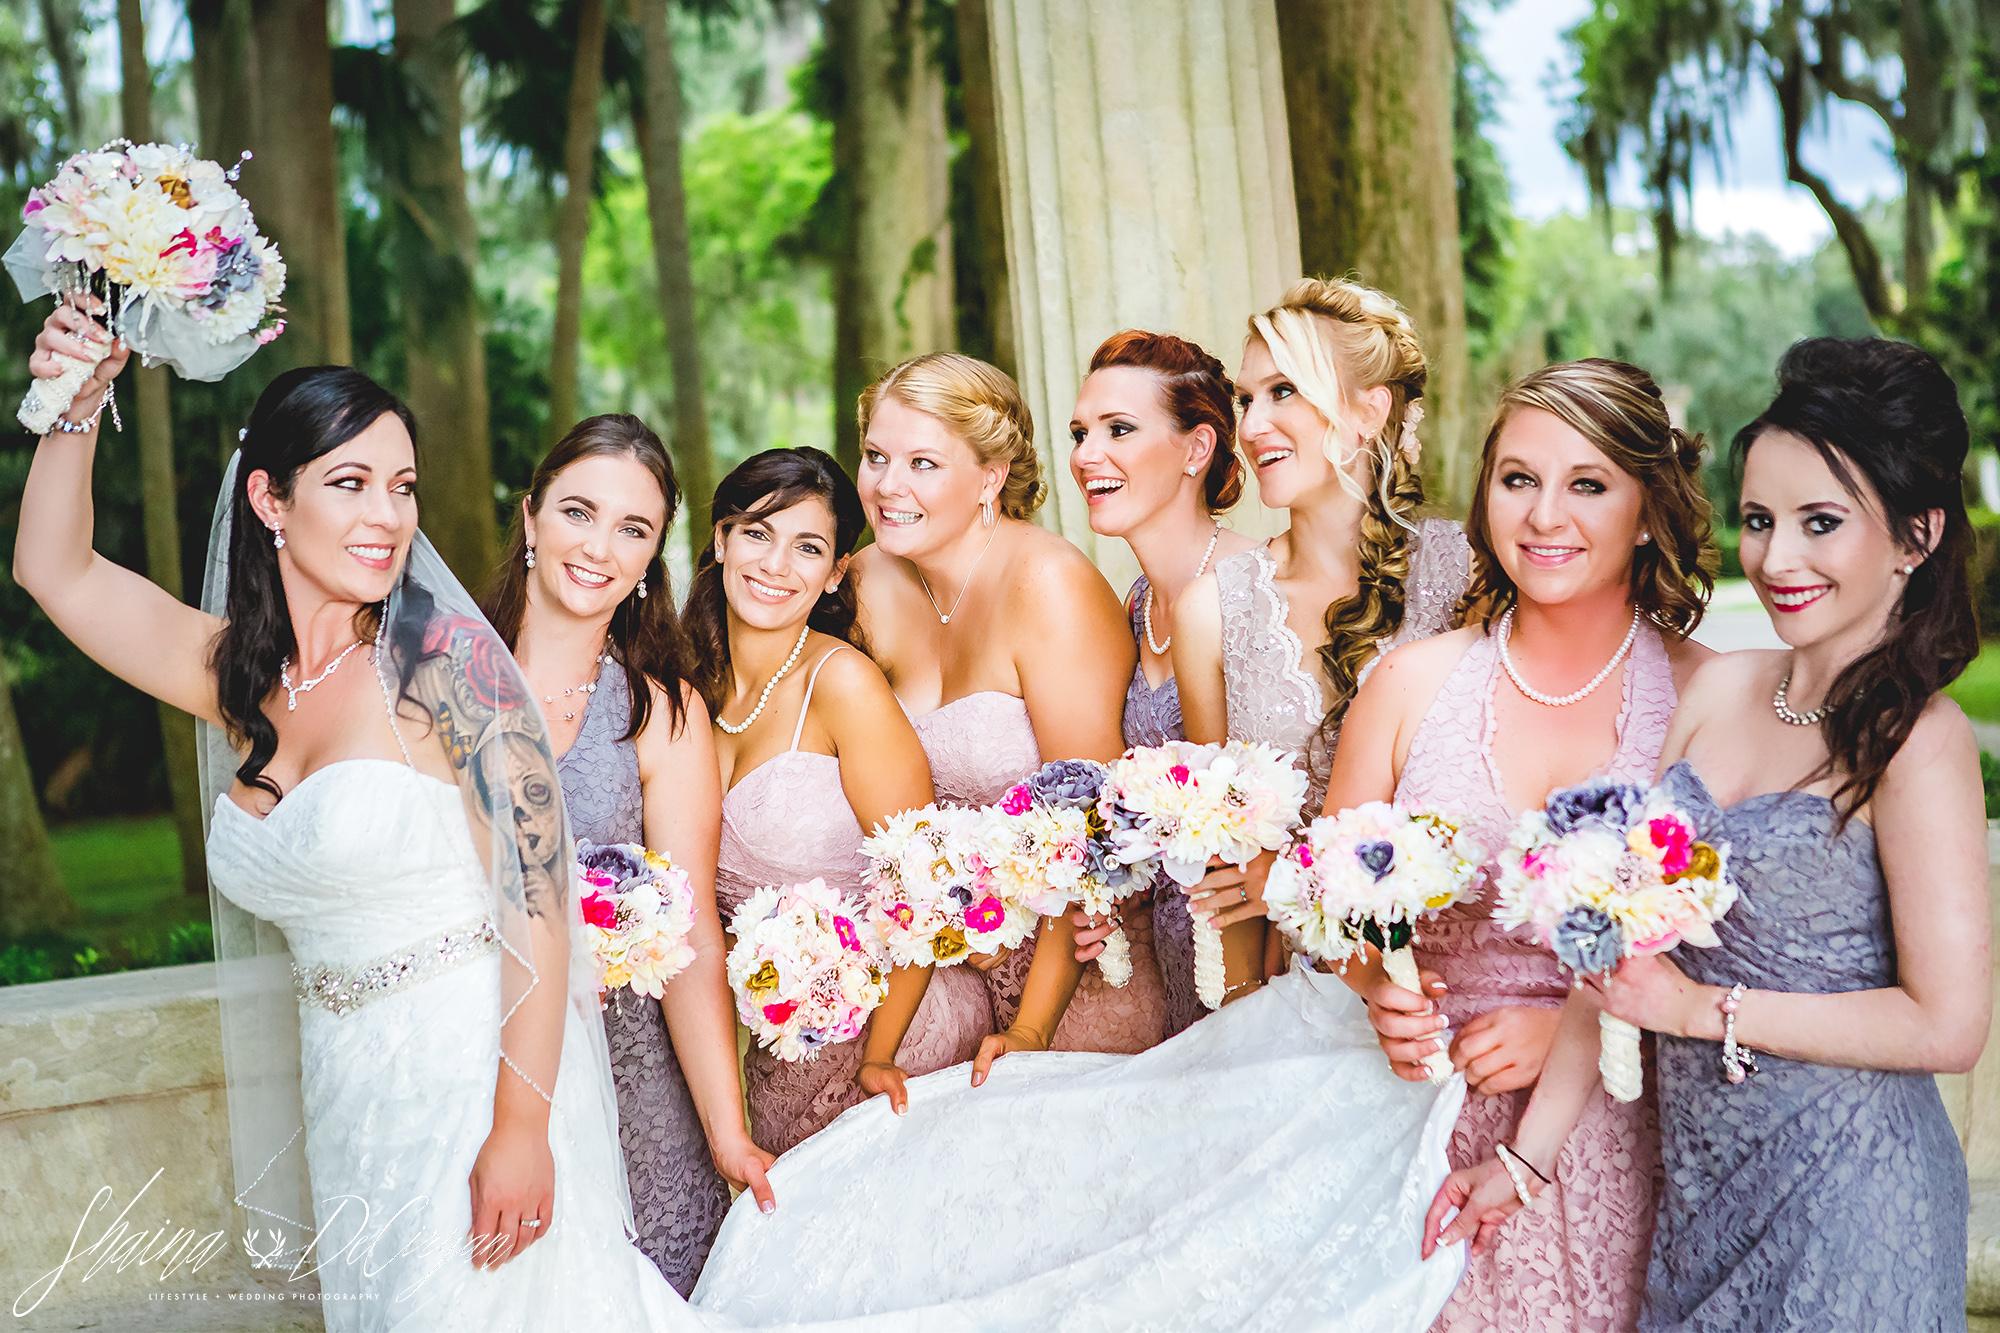 Kraft Azalea Winter Park Wedding Bridesmaids Group Photos Pink Grey Lace Gowns